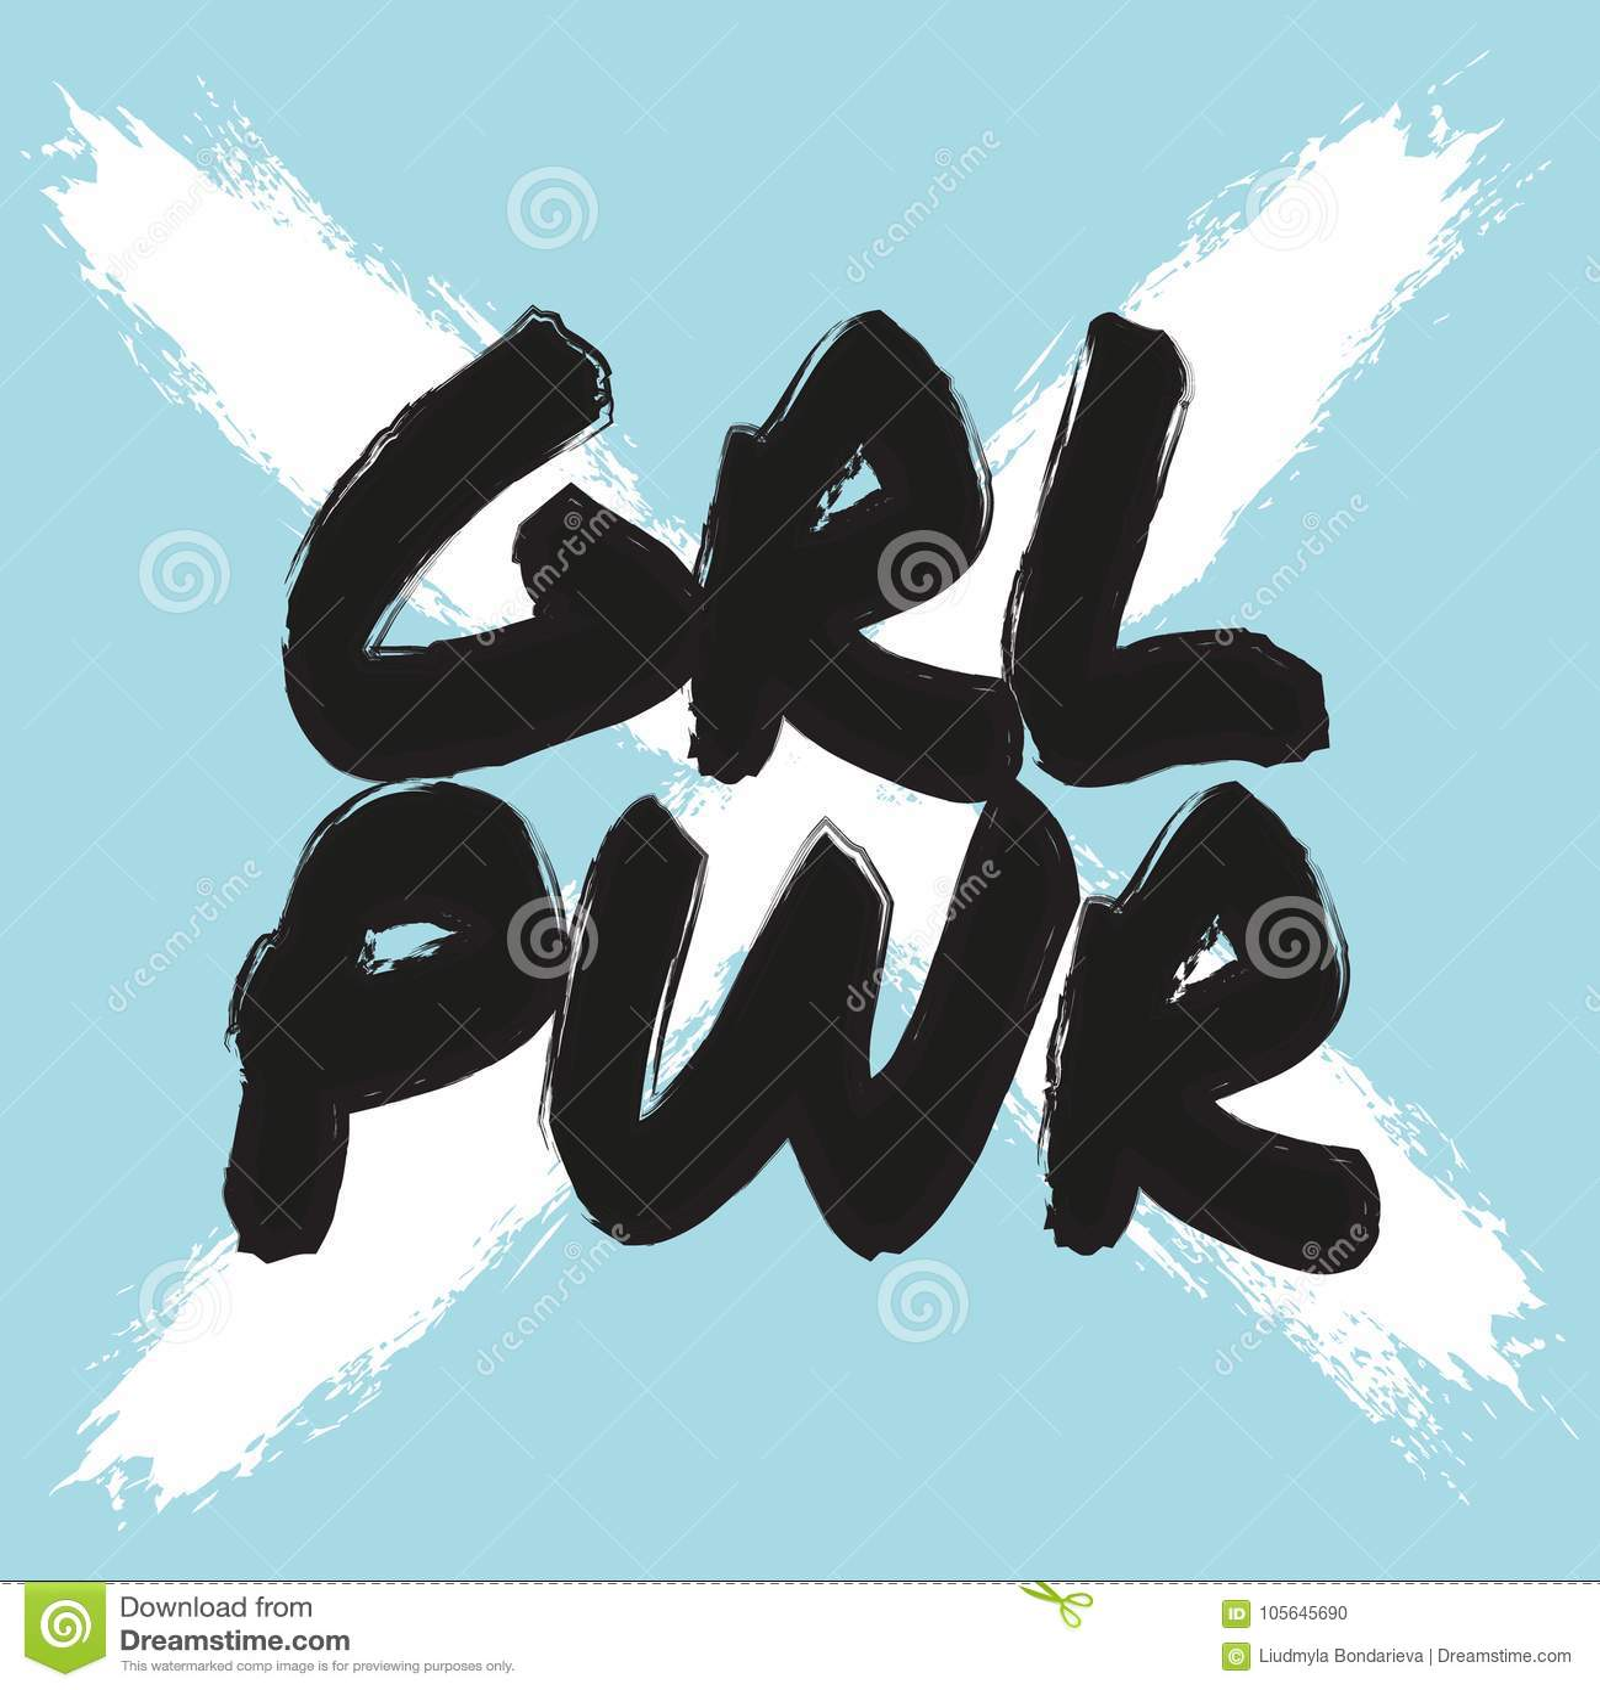 Girl power poster. Vector feminist print. Cool blue white girly slogan quote. Feminism lettering t-shirt print, freedom